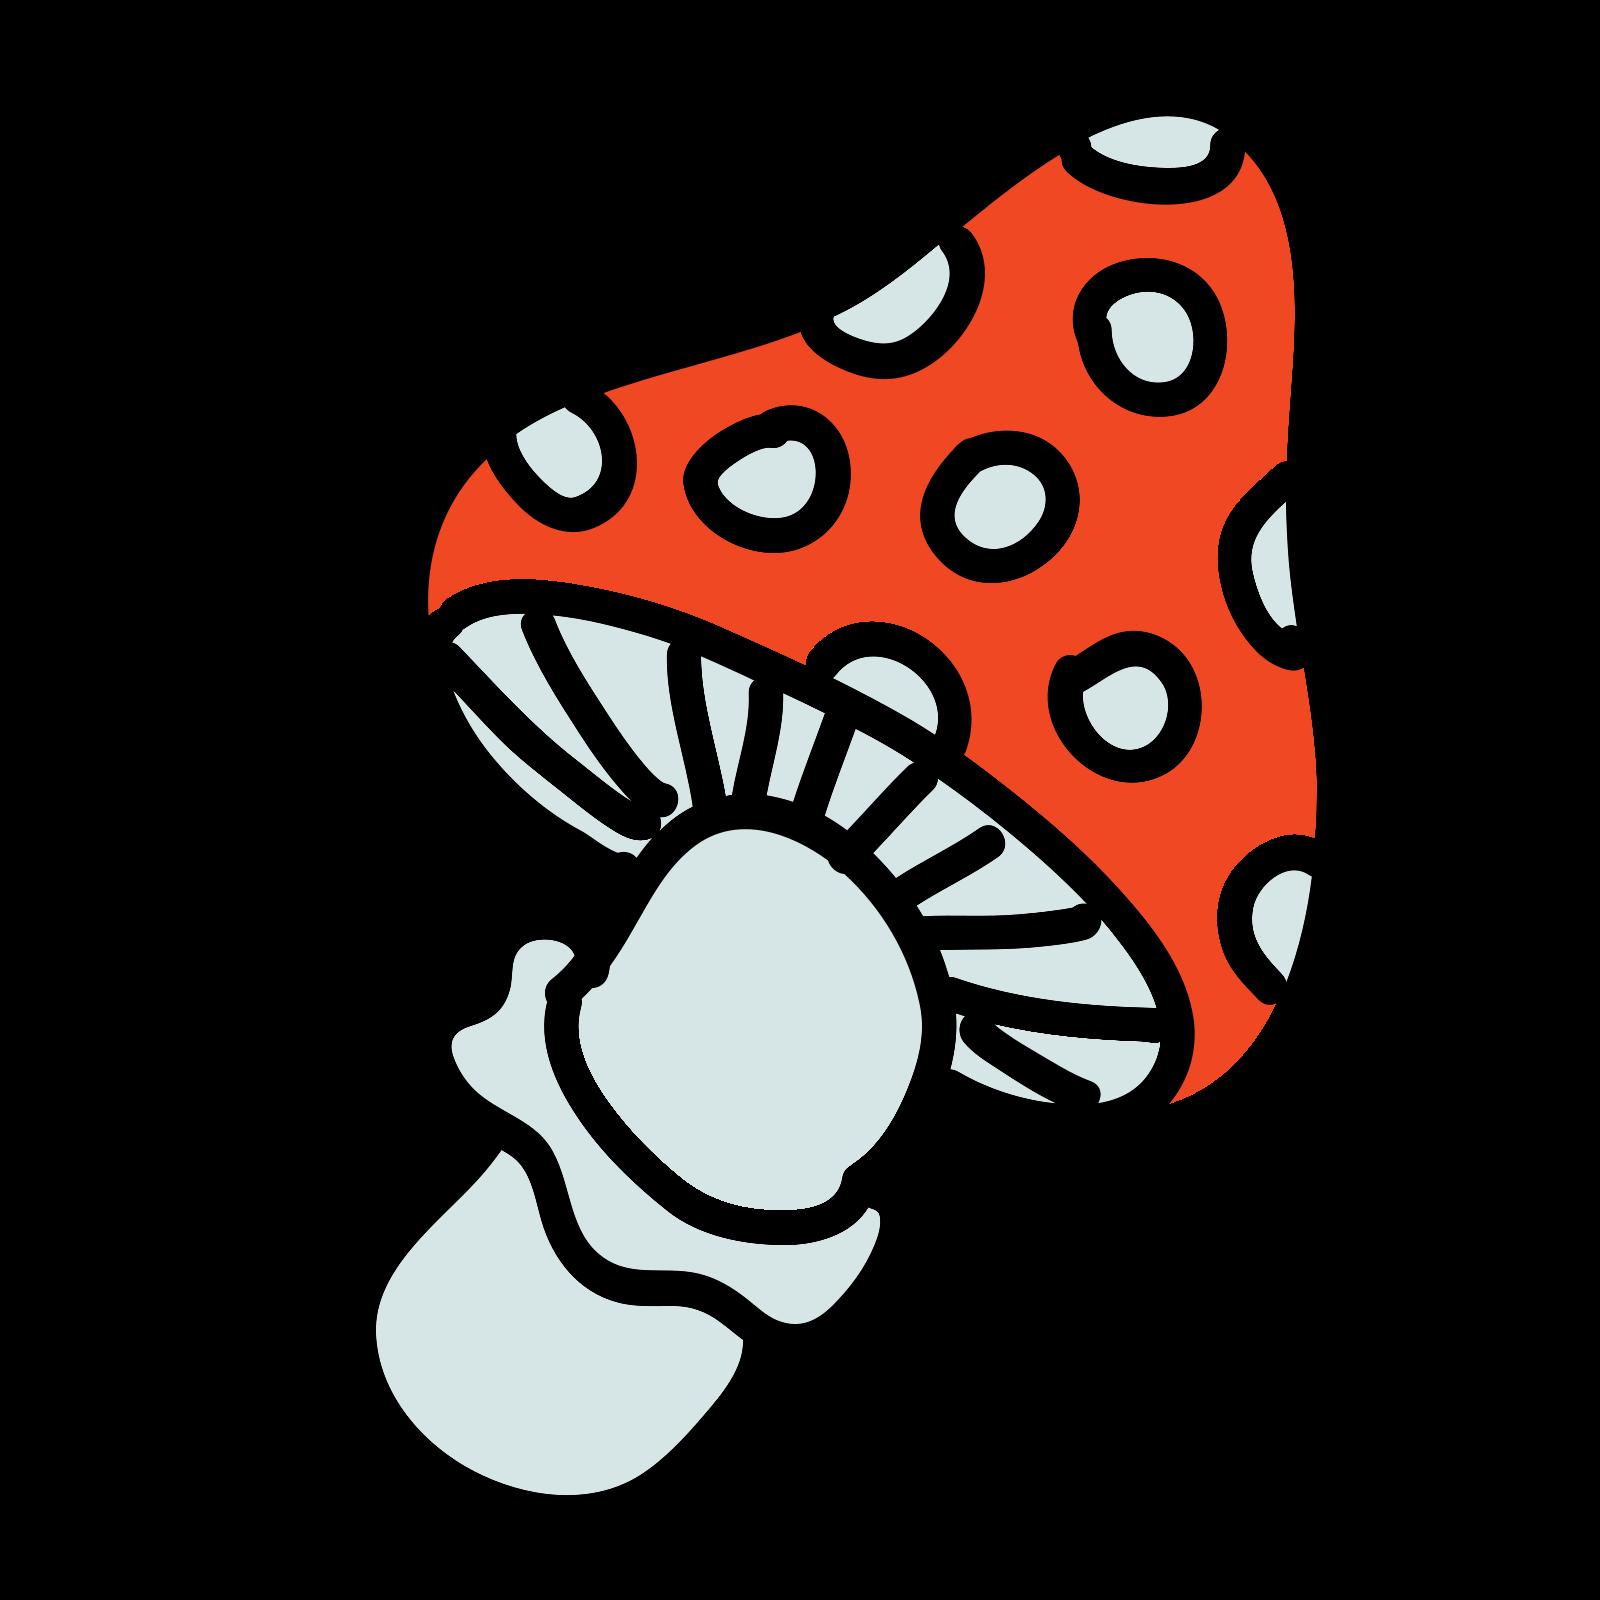 Amanita icon